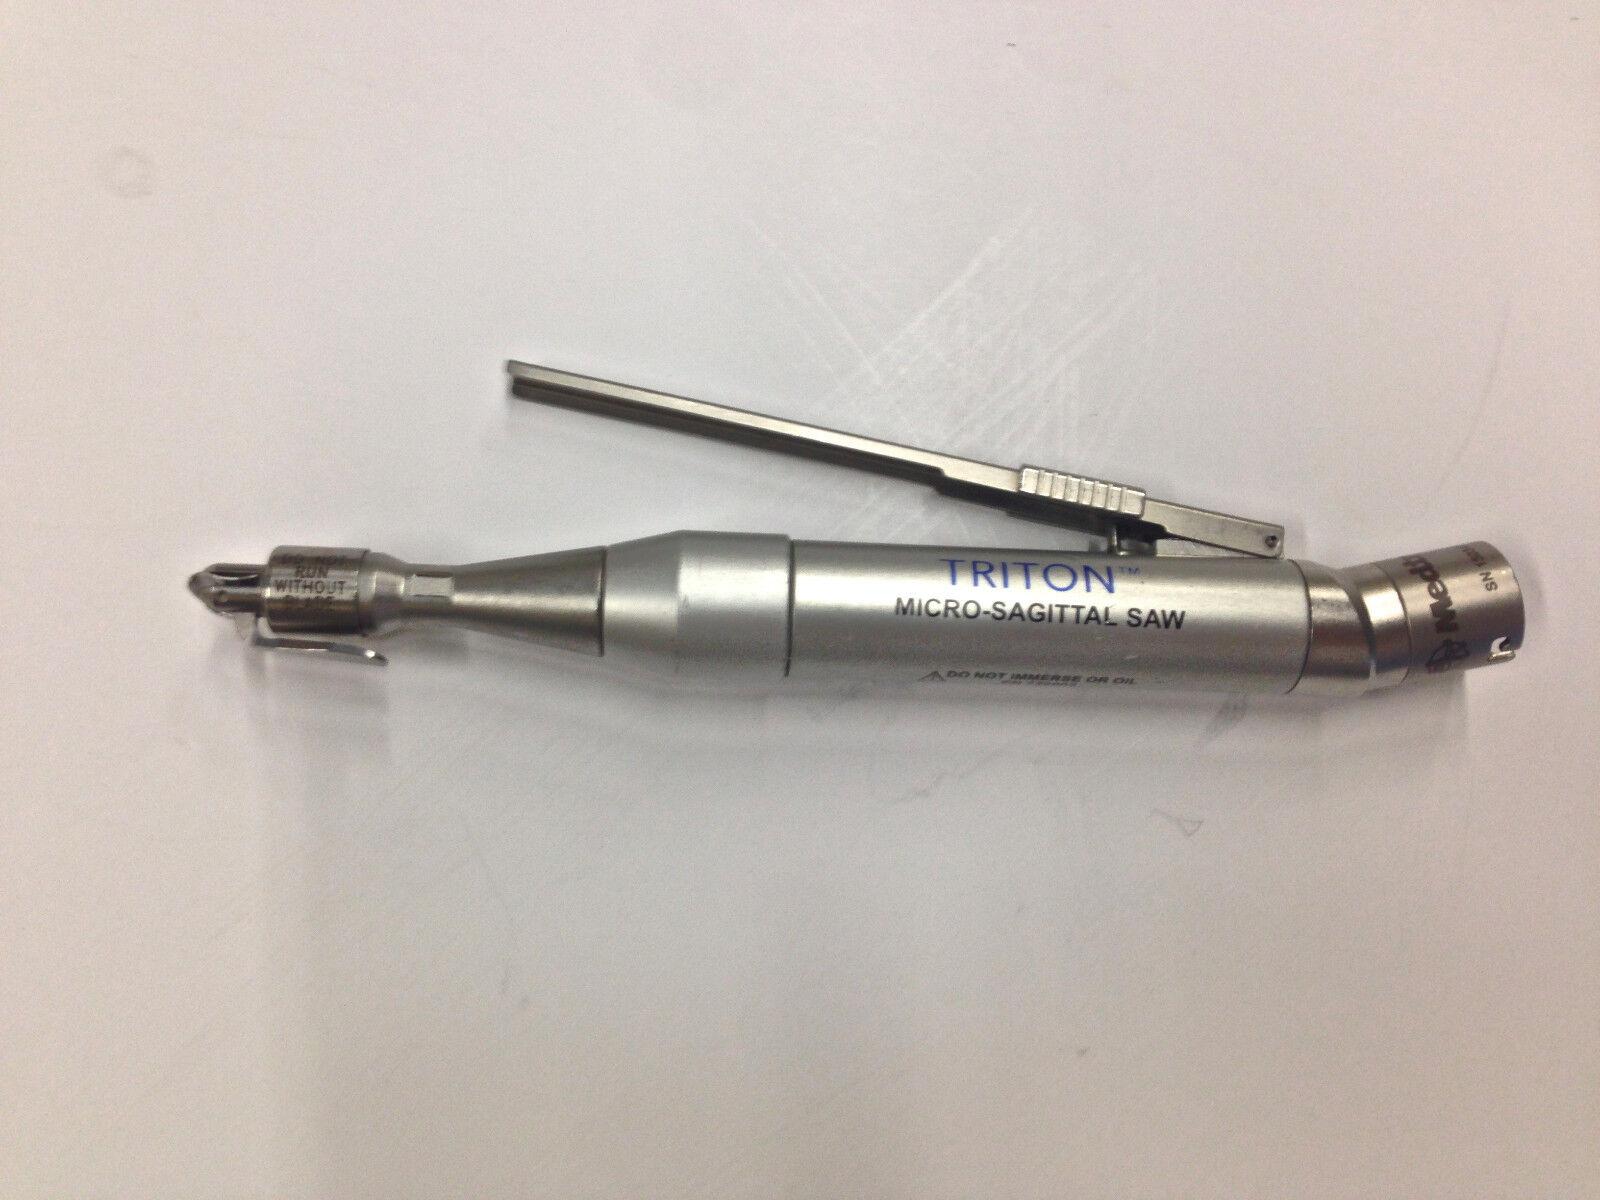 Medtronic Triton 720002 Micro-sagittal Saw | eBay